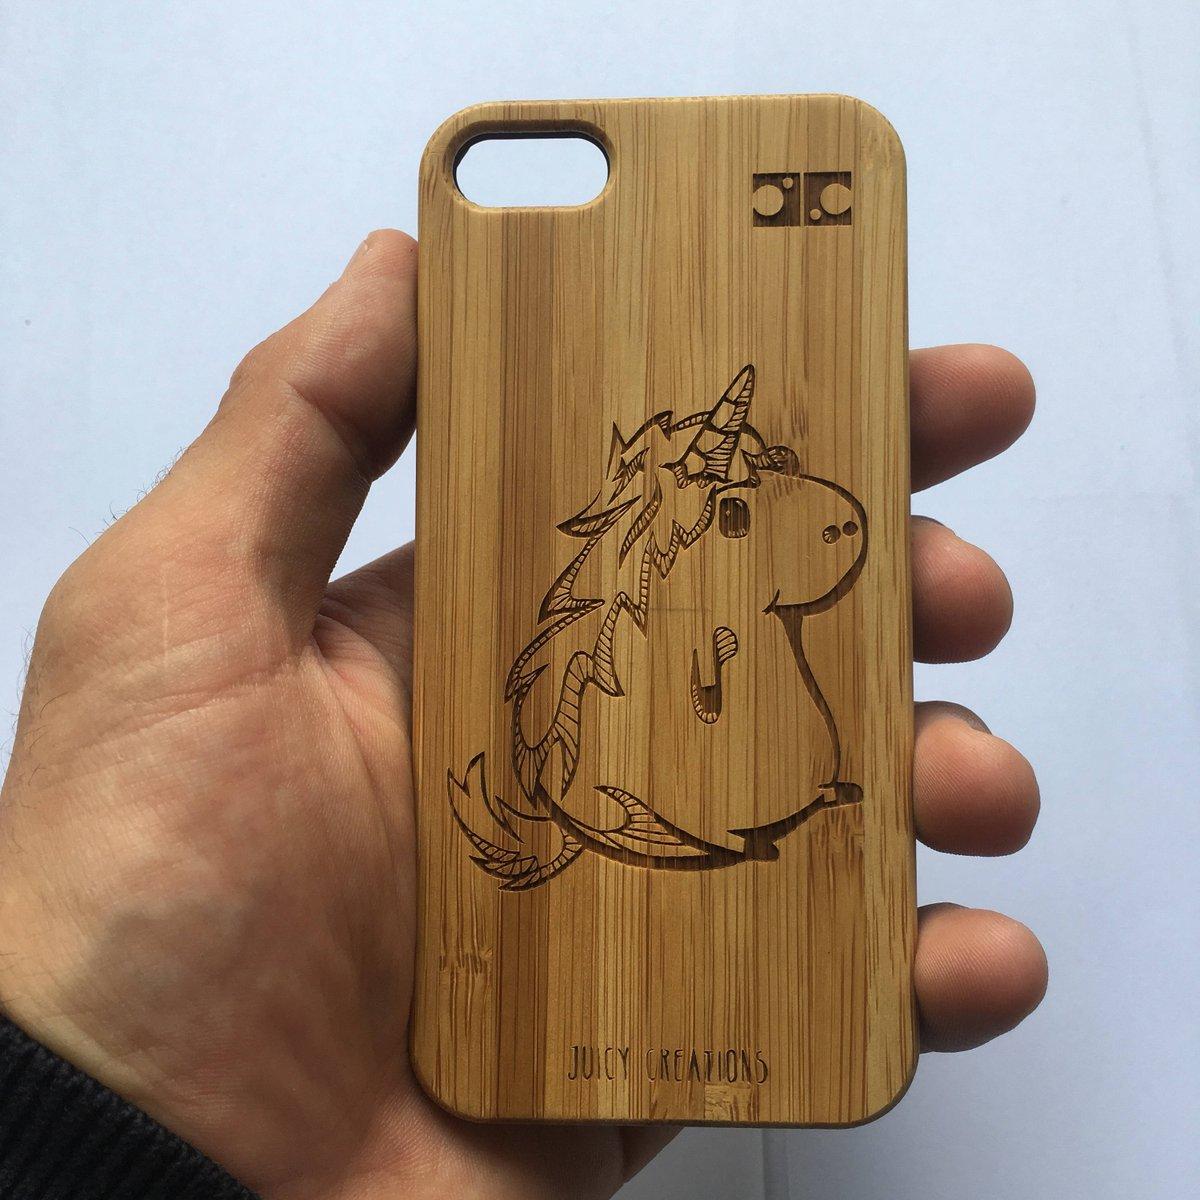 Juicy Creations On Twitter Cute Cartoon Unicorn Bespoke Wooden Engraved Bamboo Phone Case Https T Co 3zyq0v60ca Etsy Unicornphonecase